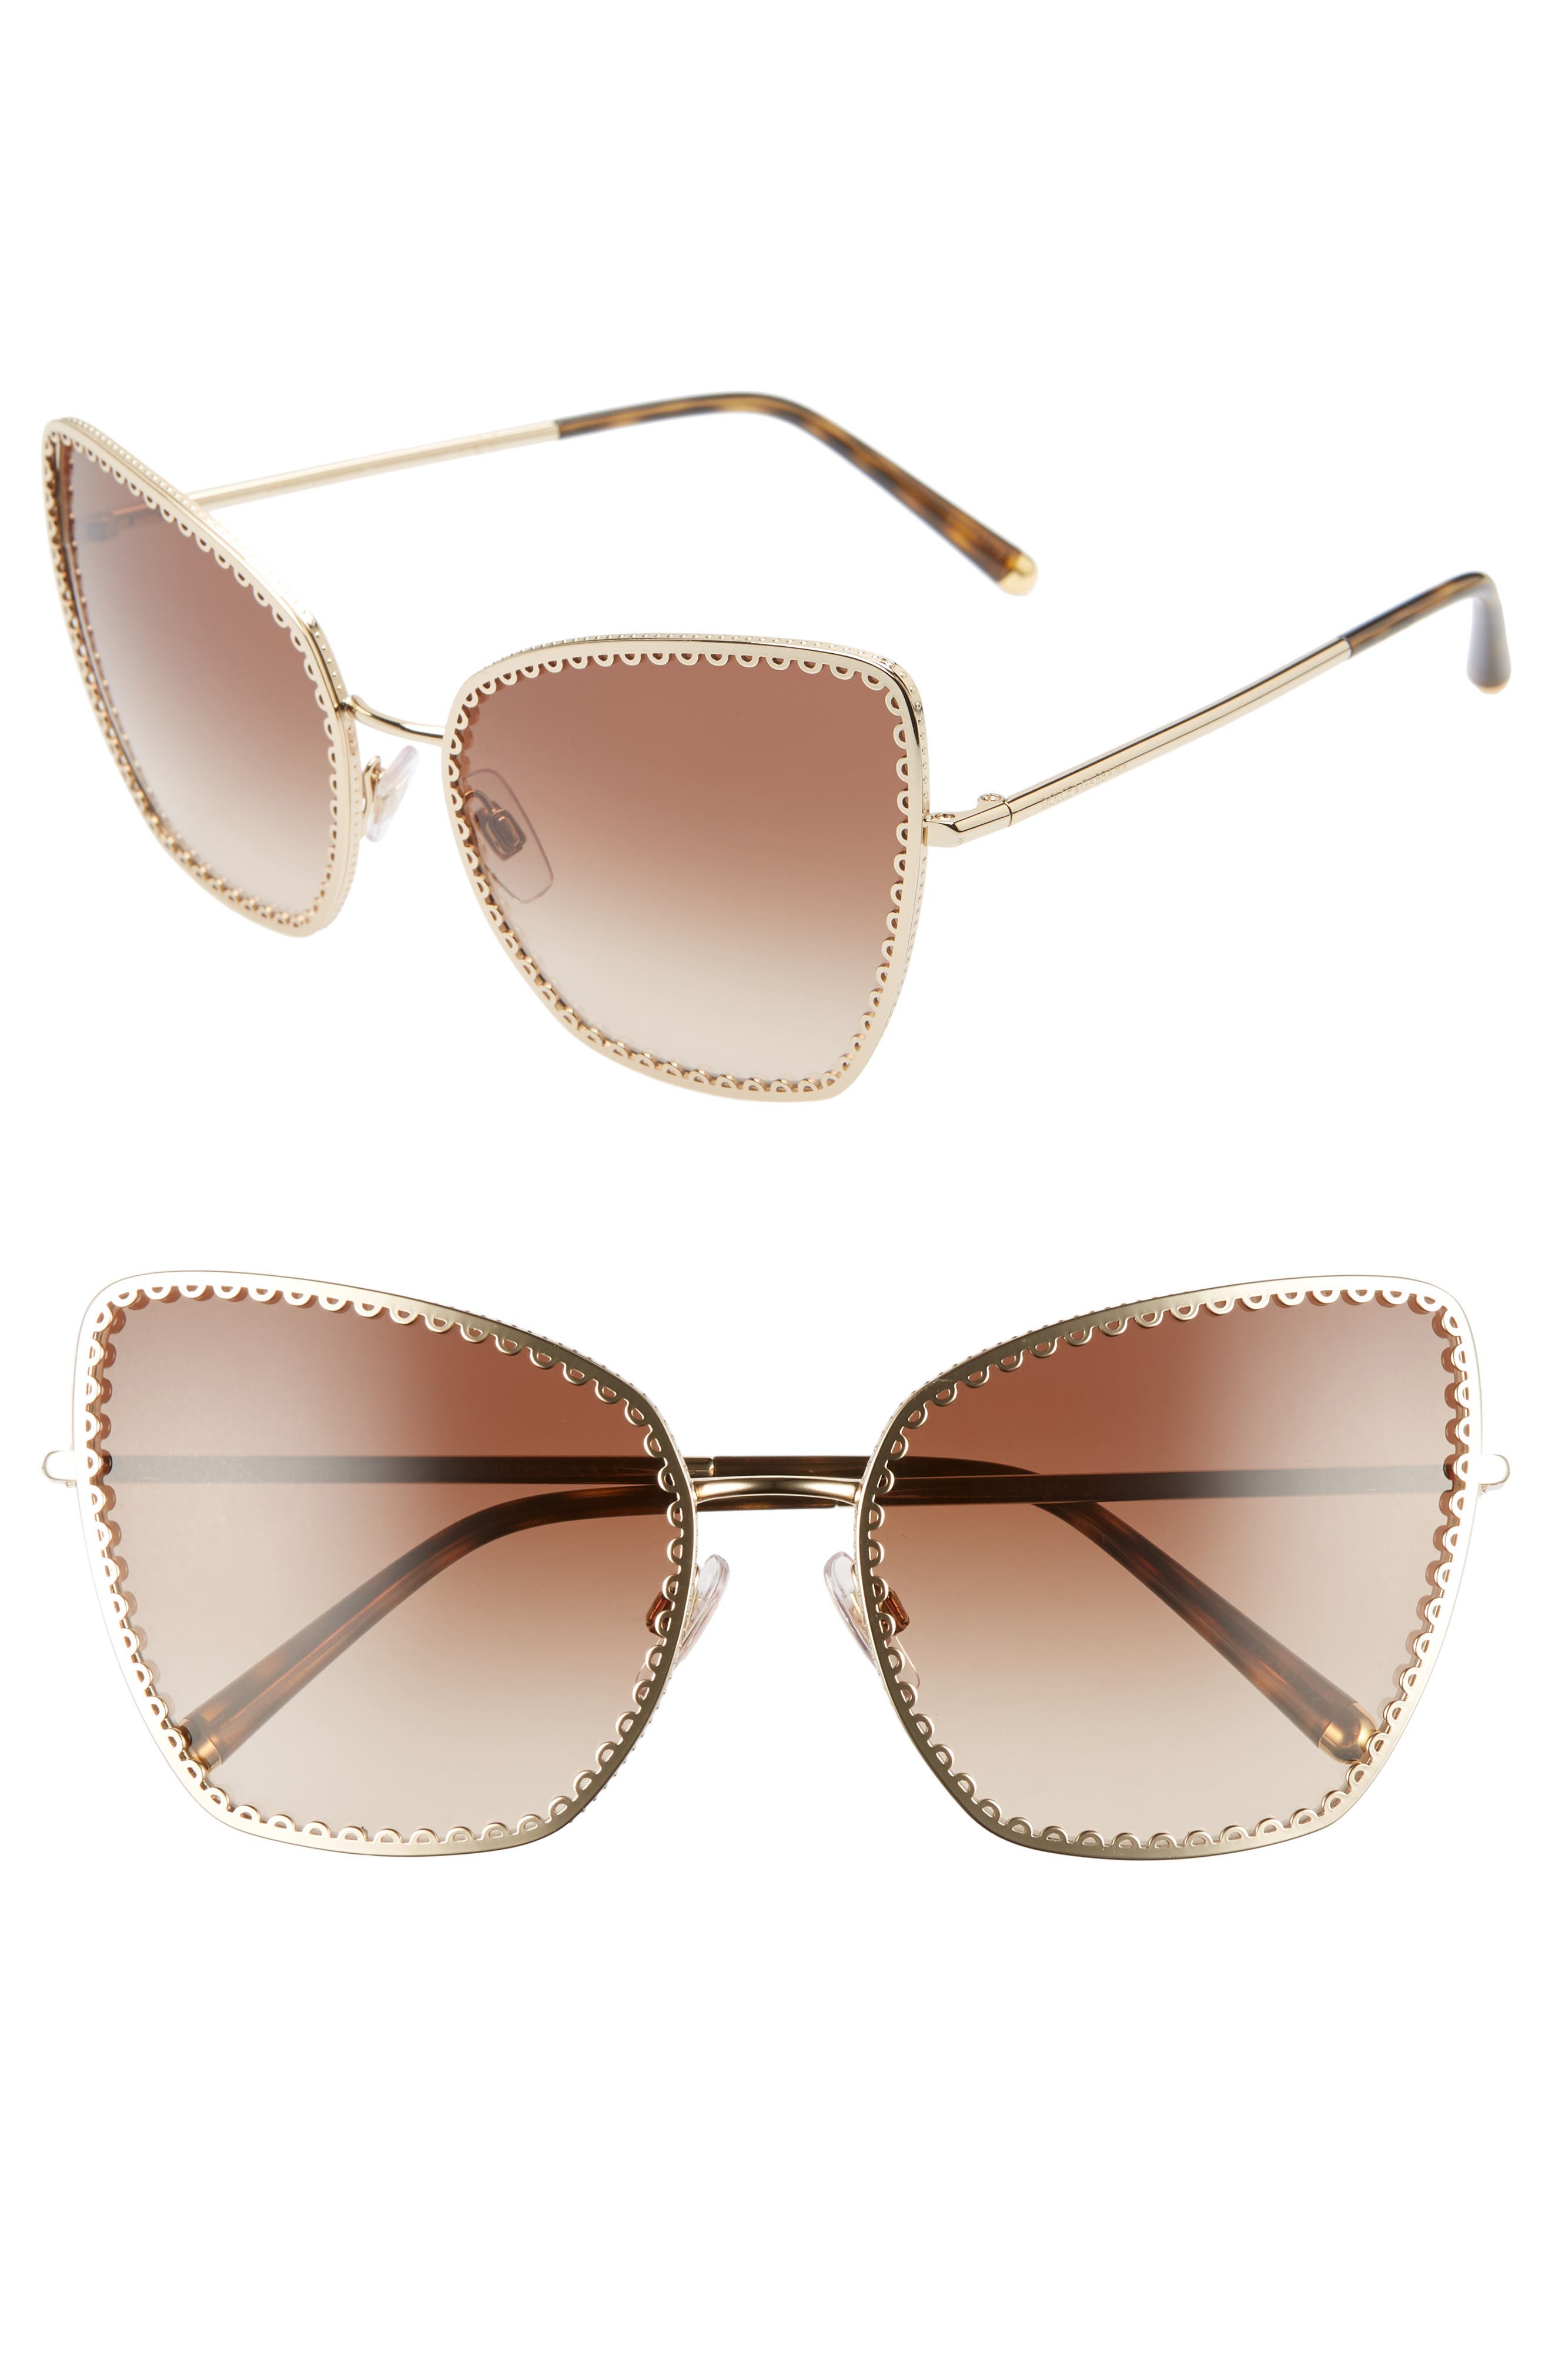 2c6fe1cdf129 Dolce   gabbana Sacred Heart 61Mm Gradient Cat Eye Sunglasses - Gold  Gradient